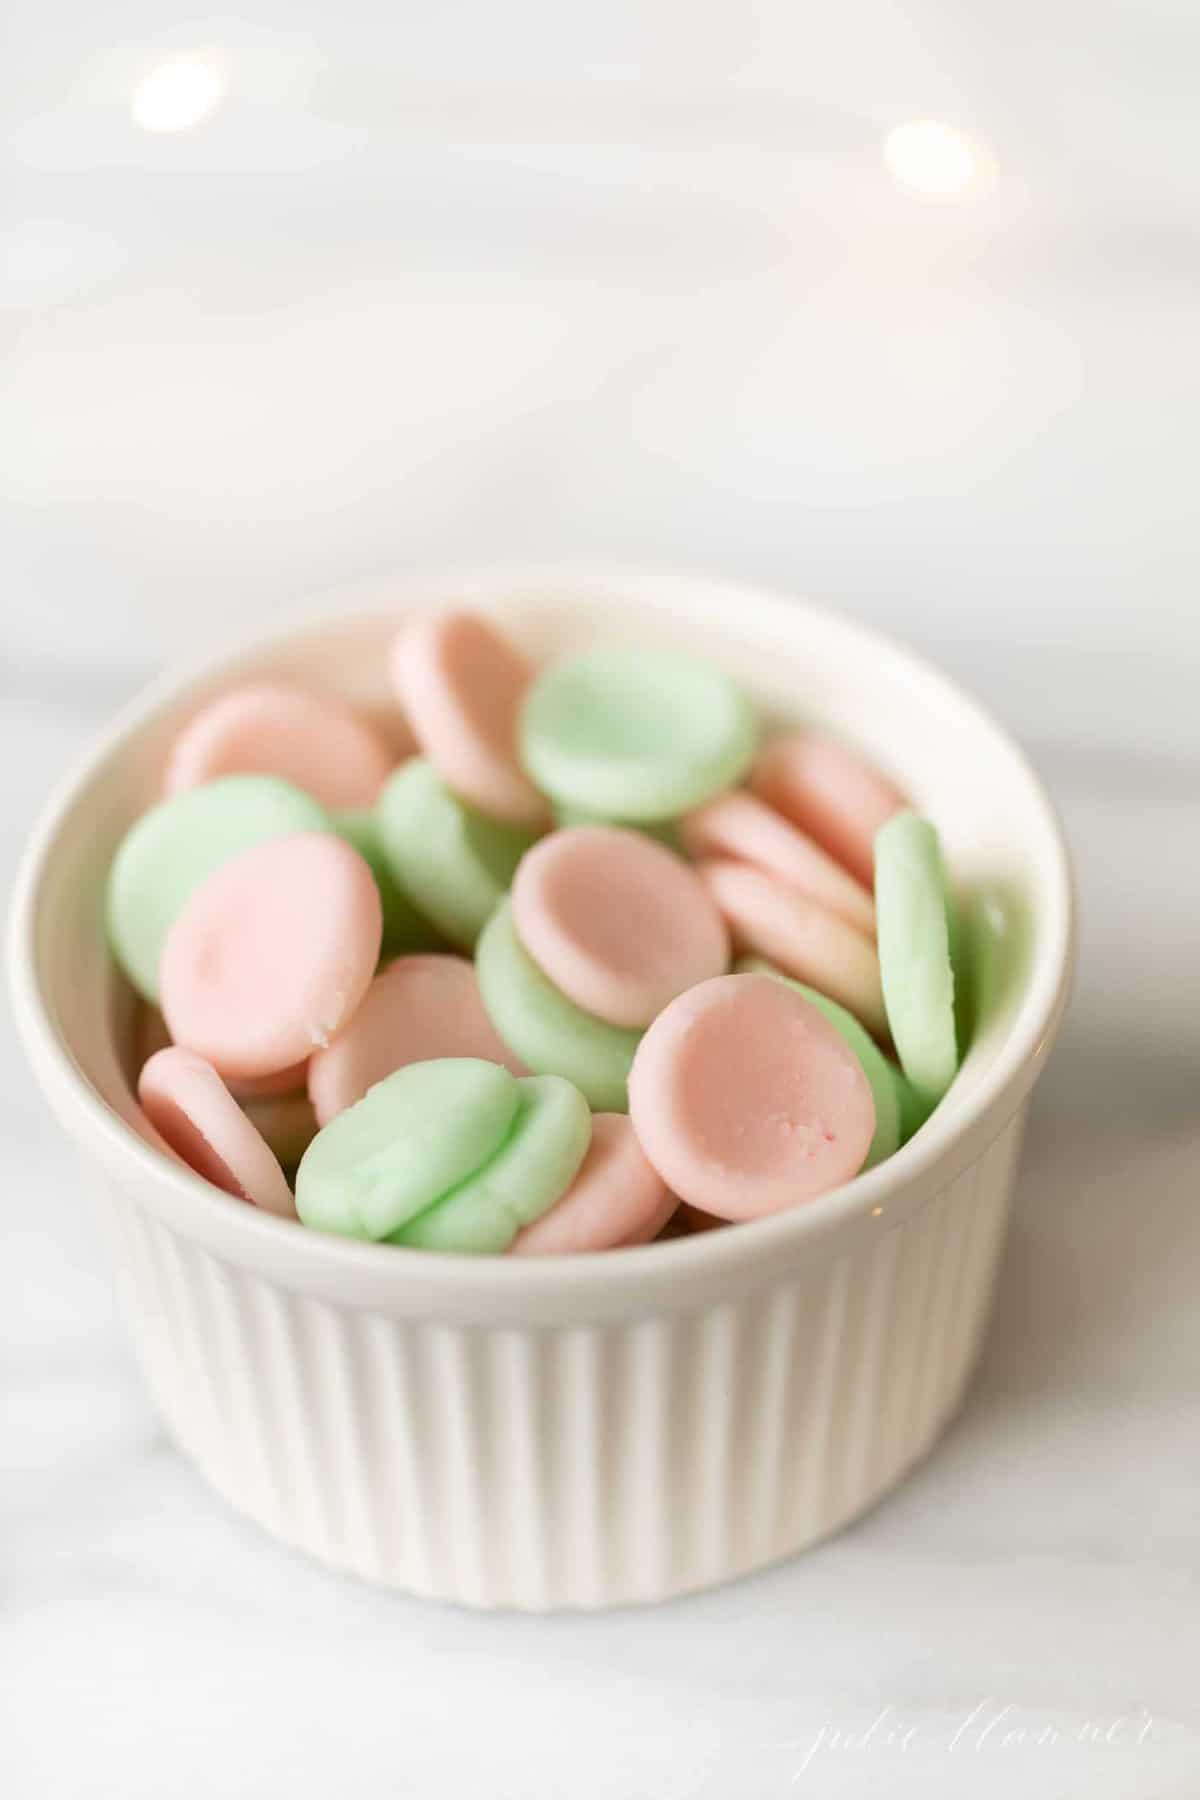 Green an pink candies in a white ramekin